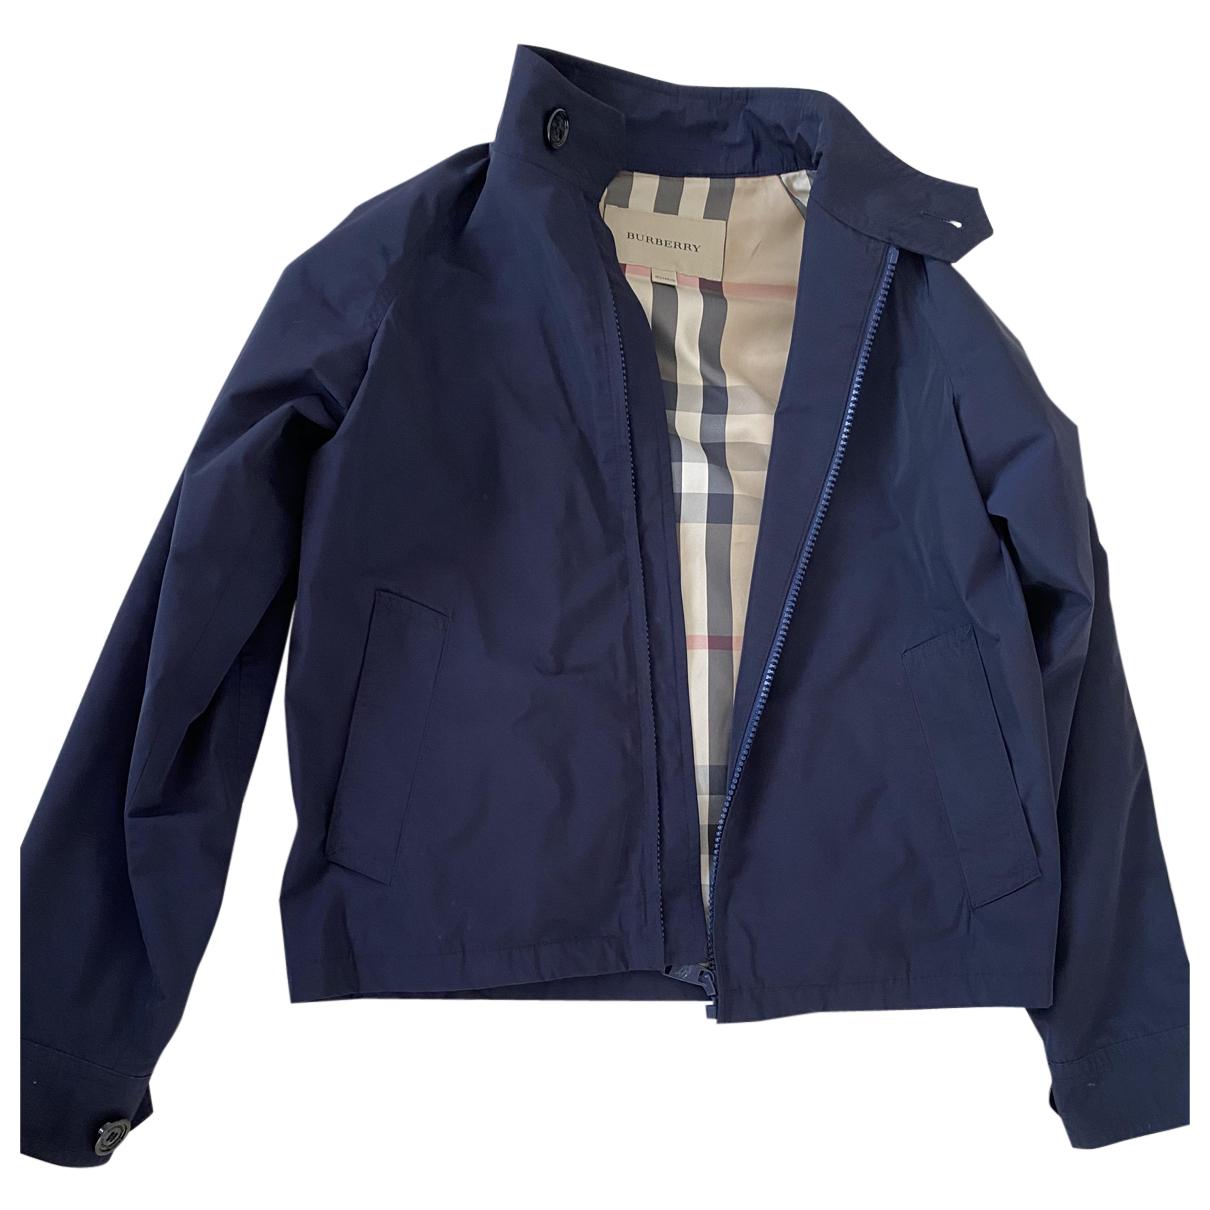 Burberry \N Jacke, Maentel in  Blau Polyester